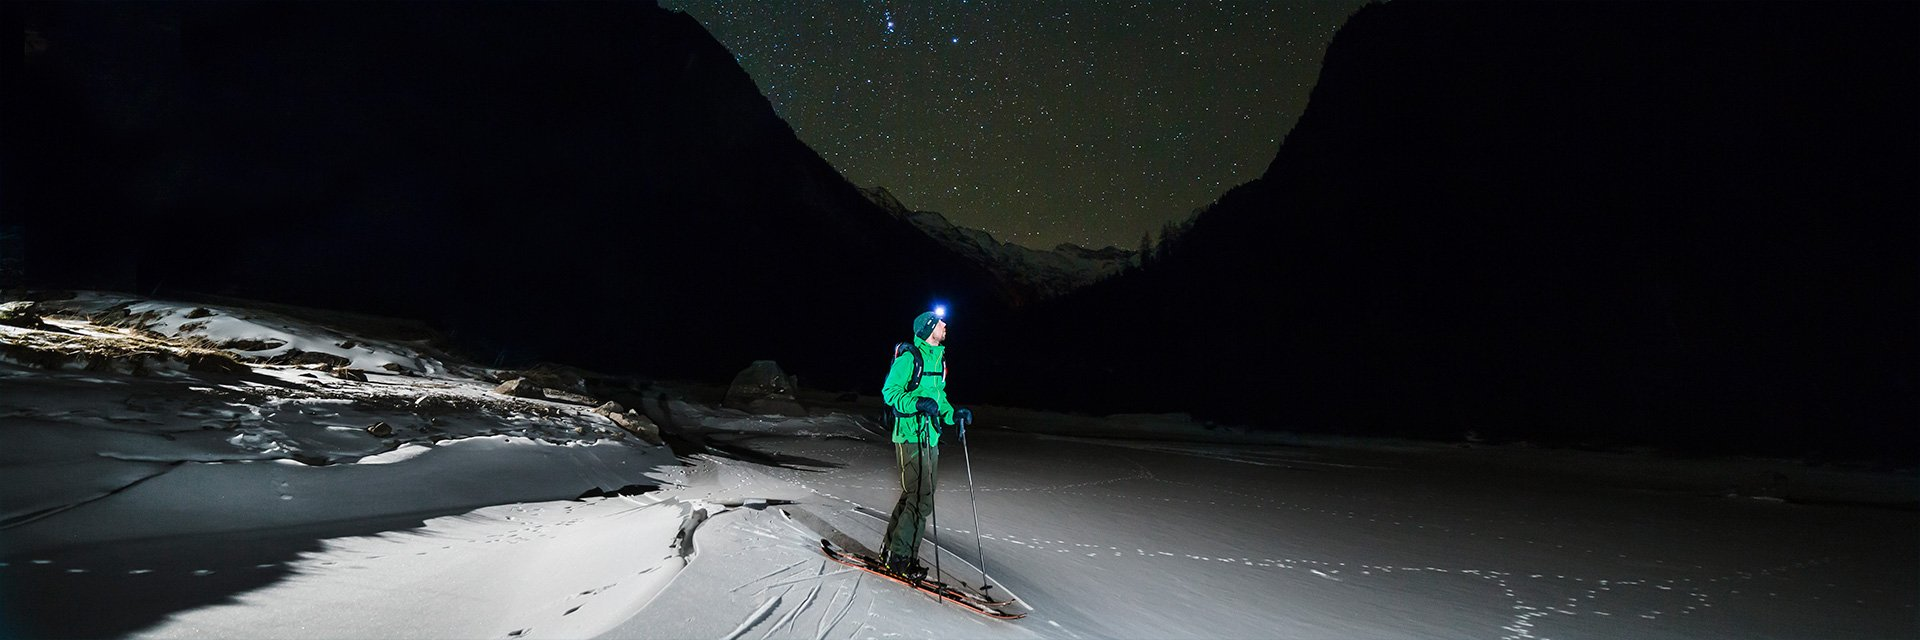 Stephan Verheij splitboarding under the stars